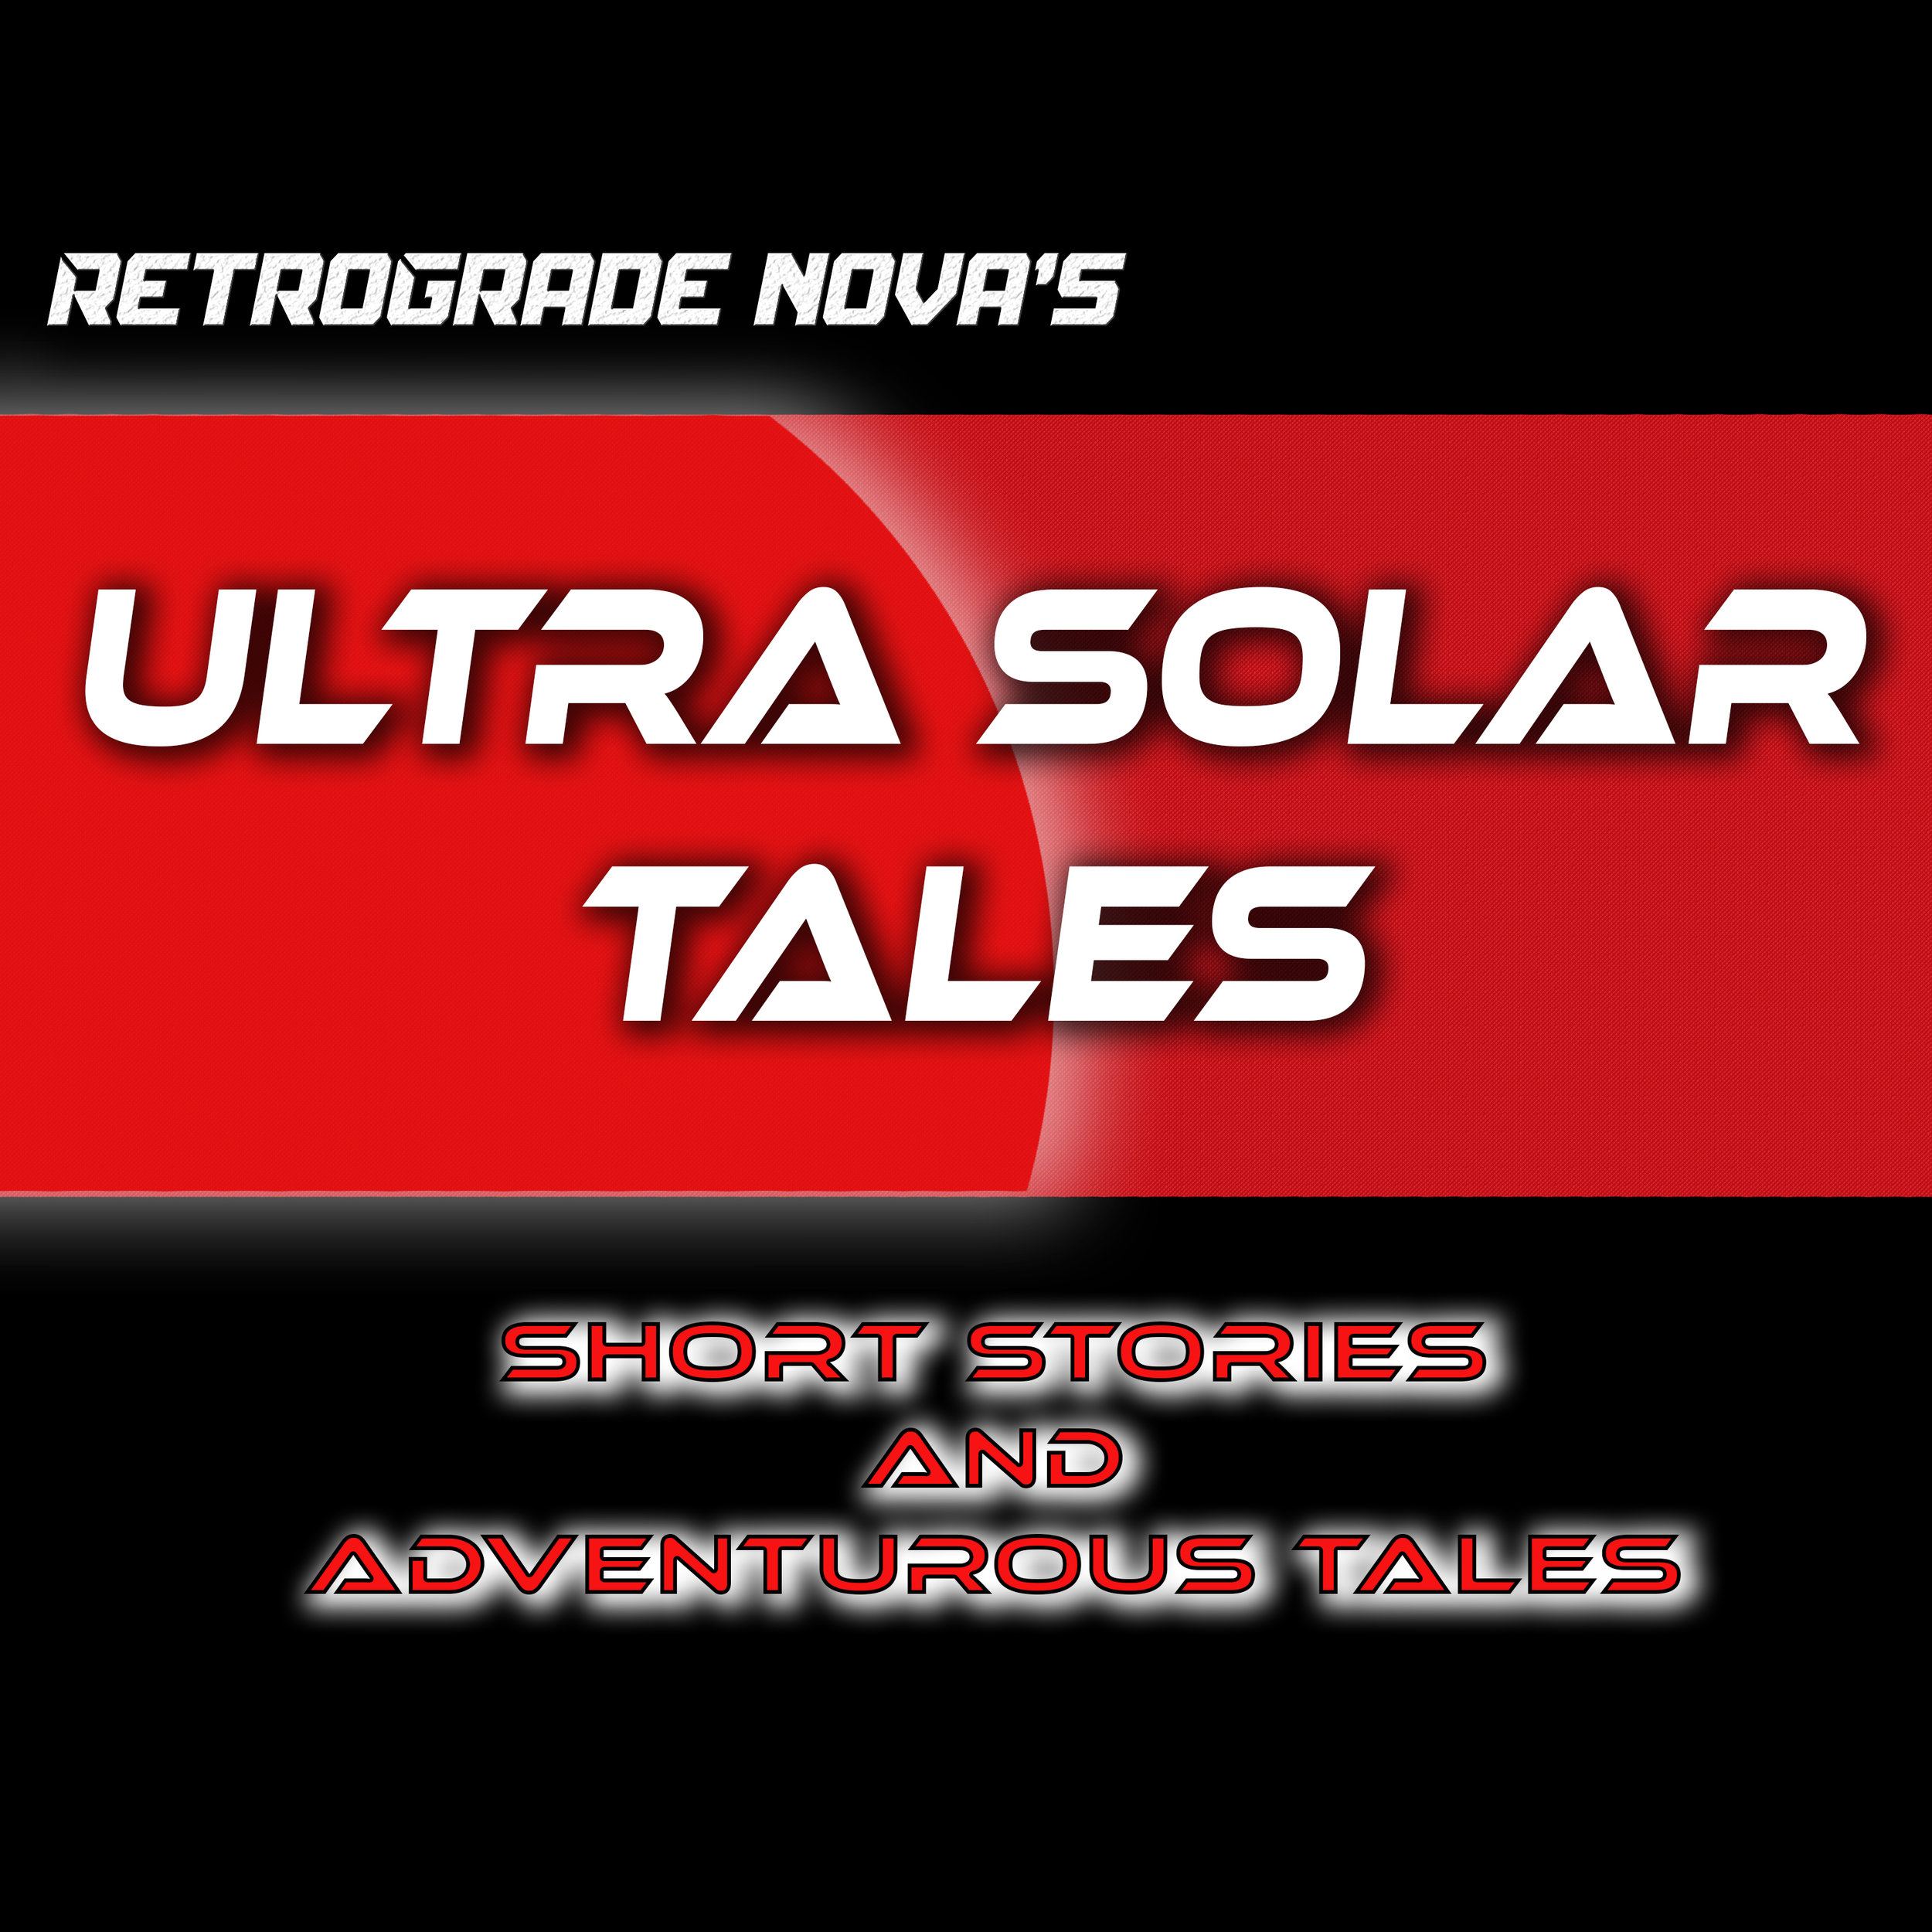 Retrograde Nova's Ultra Solar Tales by Erika Christie